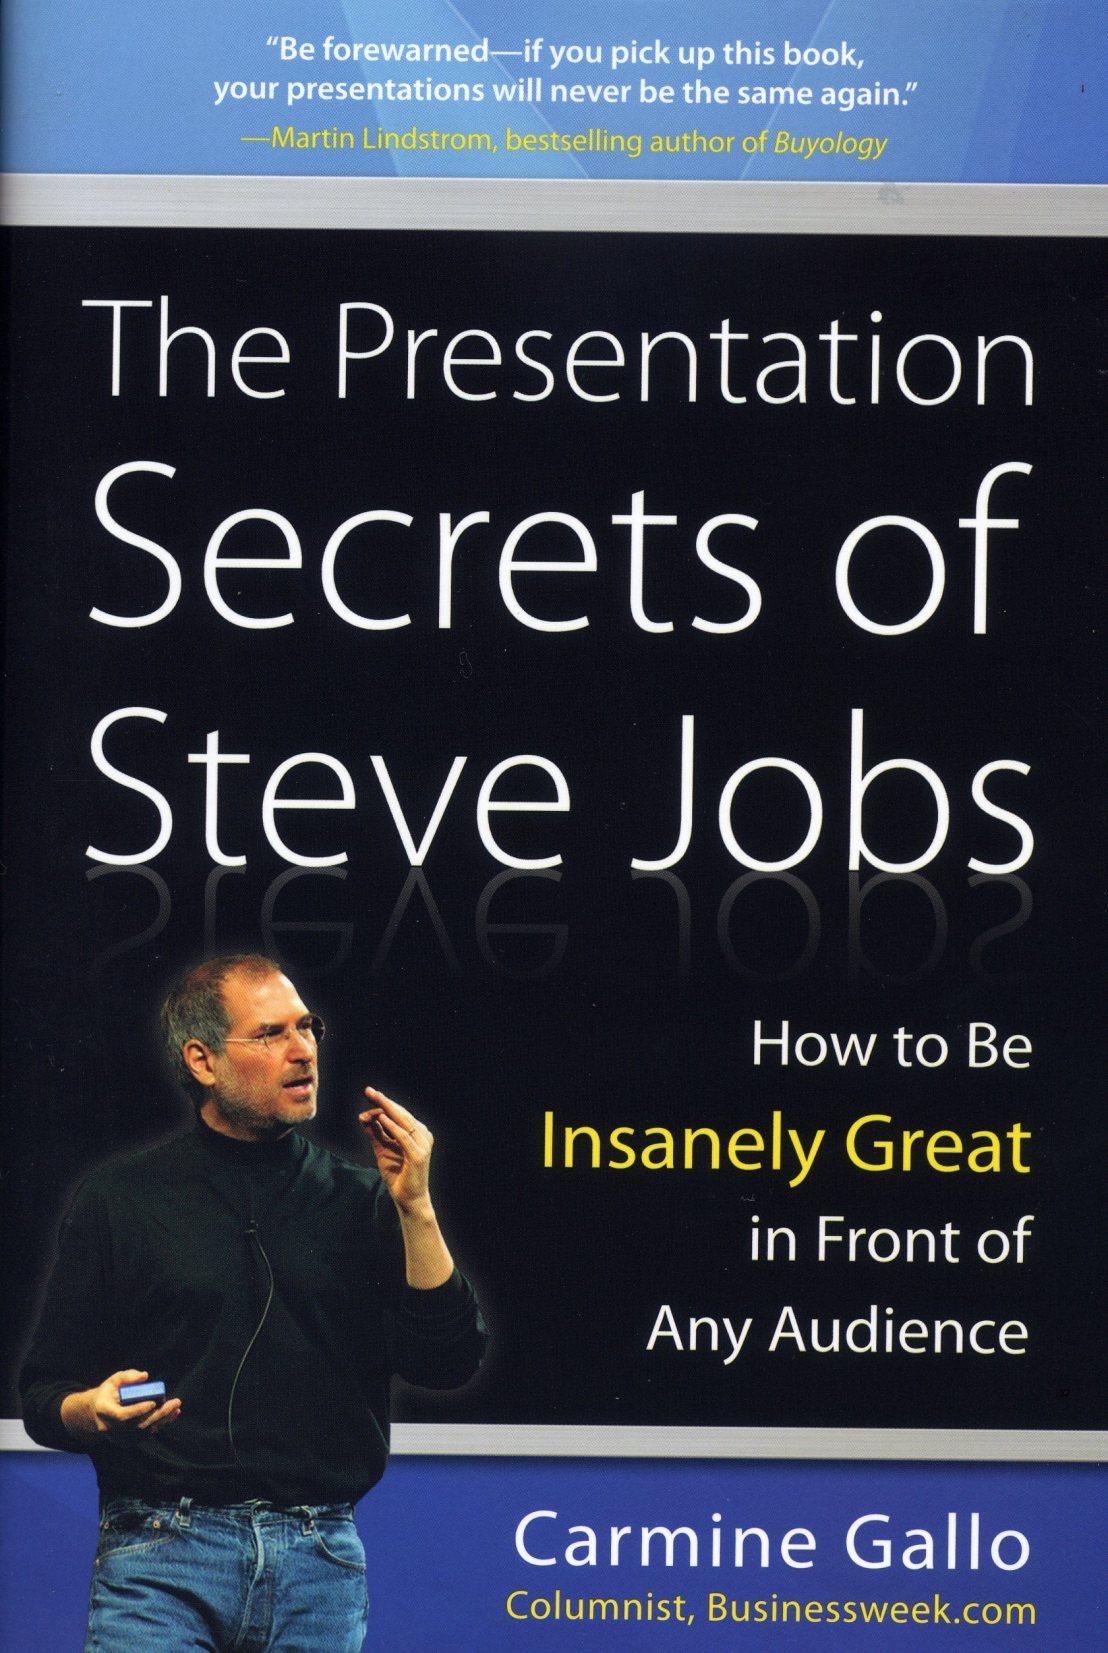 Ten Secrets that Made Steve Jobs' Presentations the World'sBest